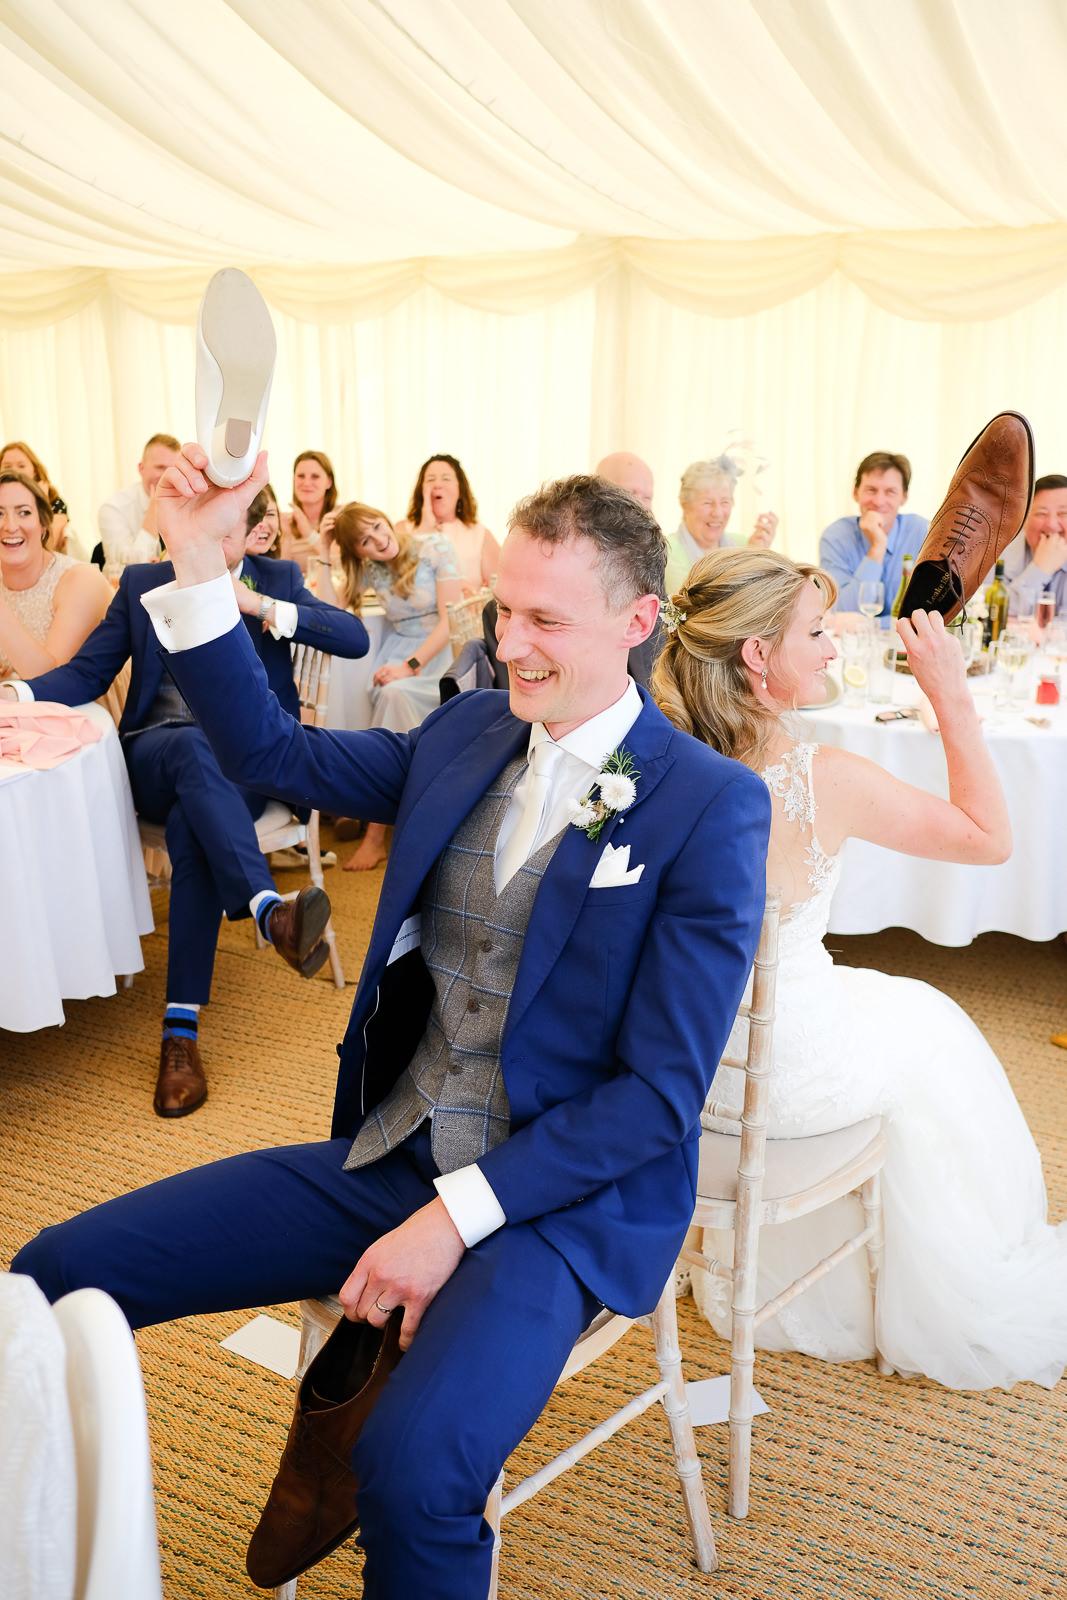 Roscarrock Farm wedding in Cornwall 066.jpg